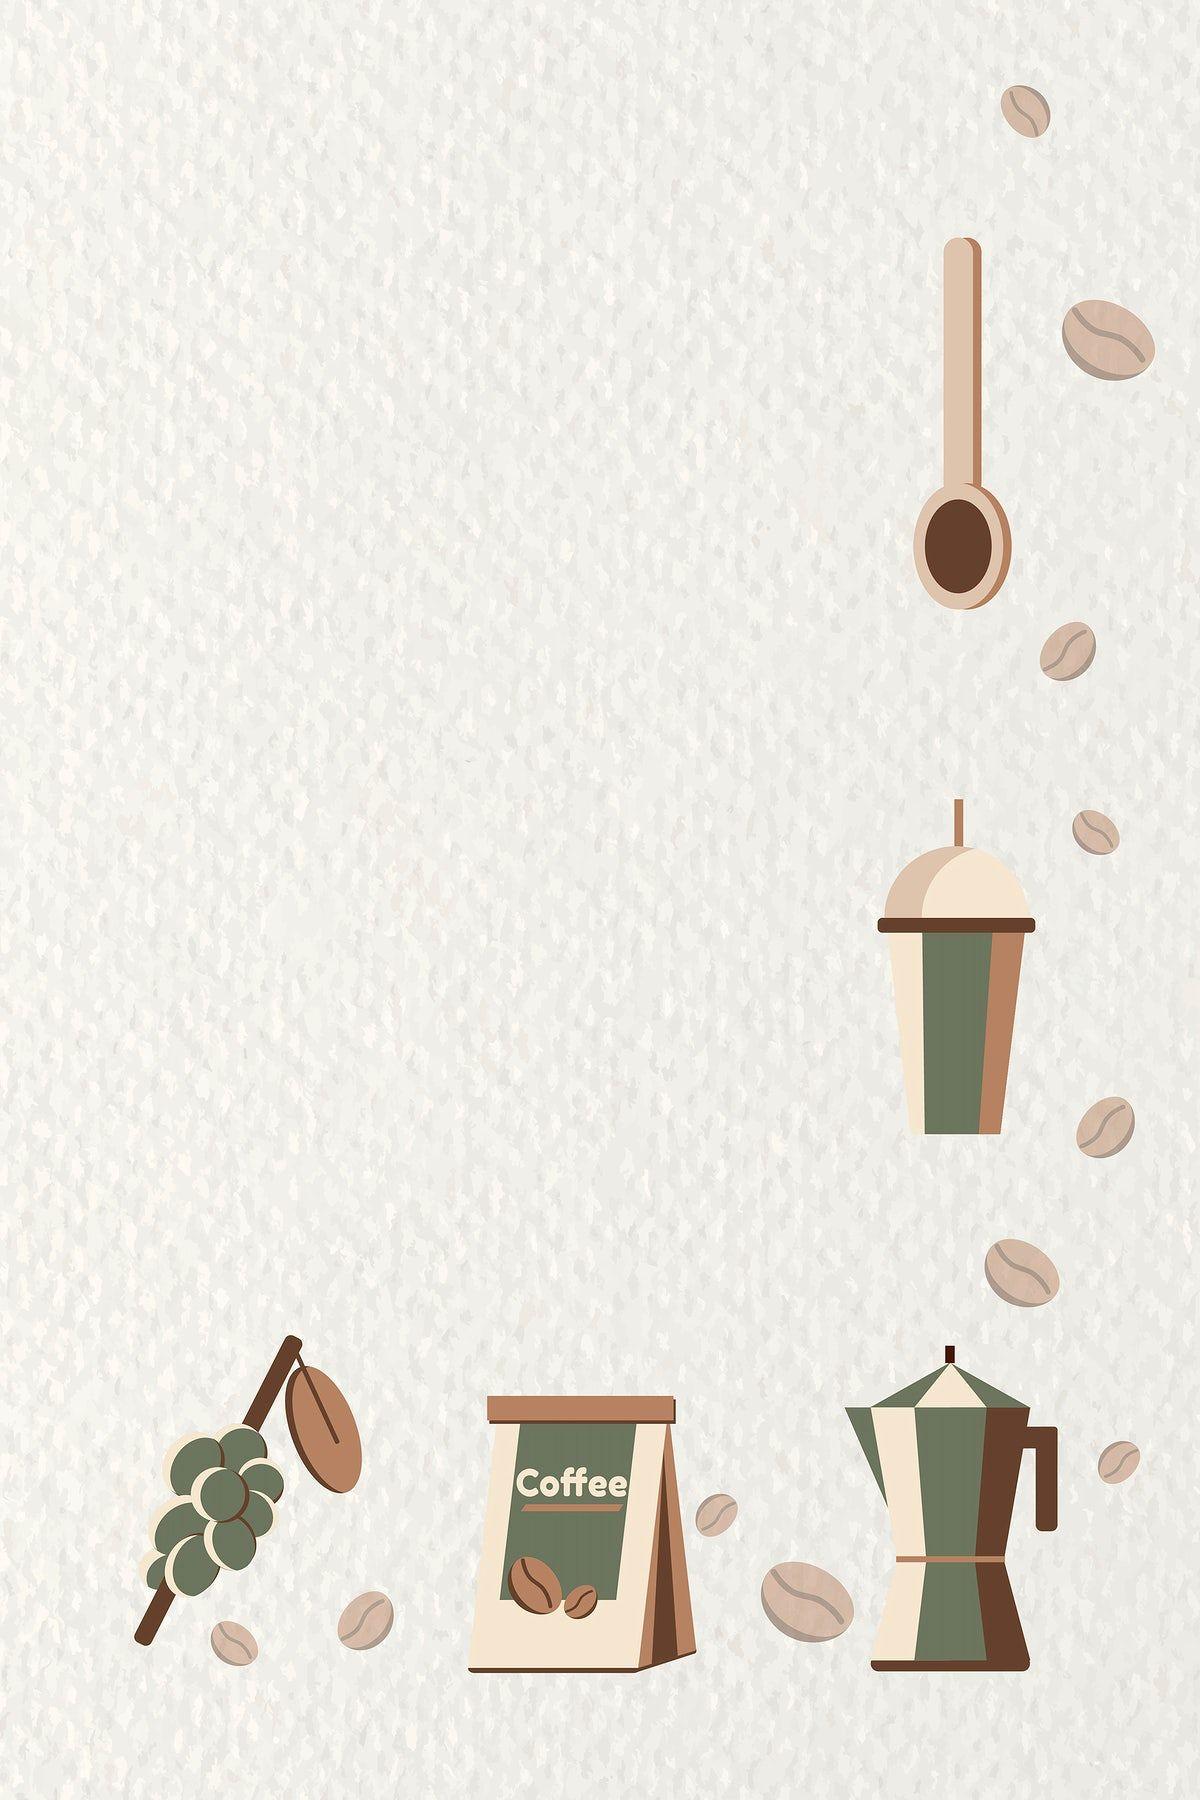 Download Premium Vector Of Coffee Poster Design Template Vector 1180455 In 2021 Coffee Poster Design Coffee Poster Poster Design